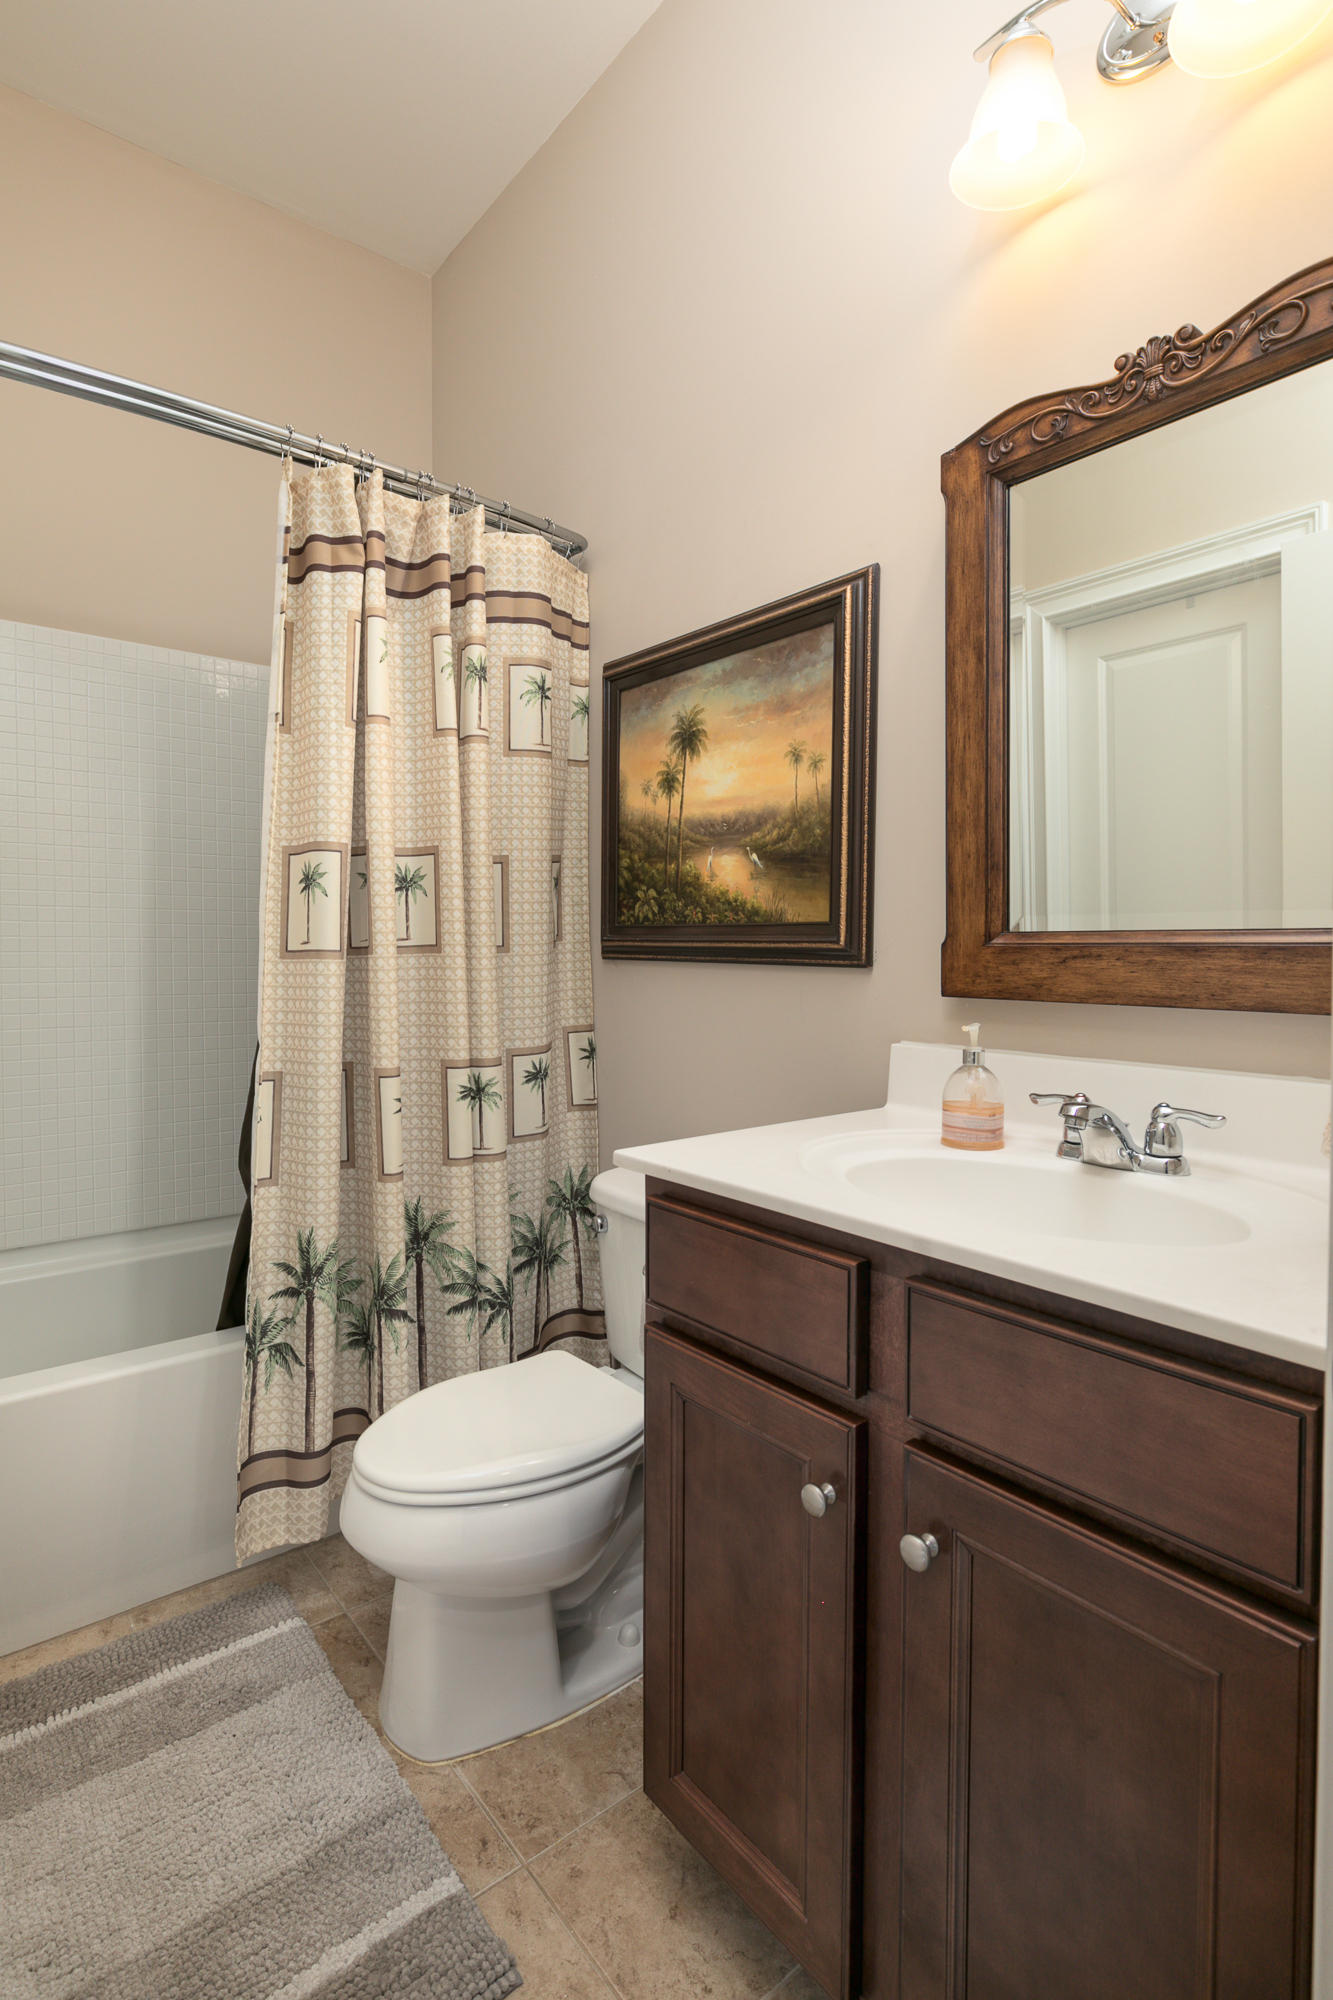 Carolina Park Homes For Sale - 1472 Croaton, Mount Pleasant, SC - 15